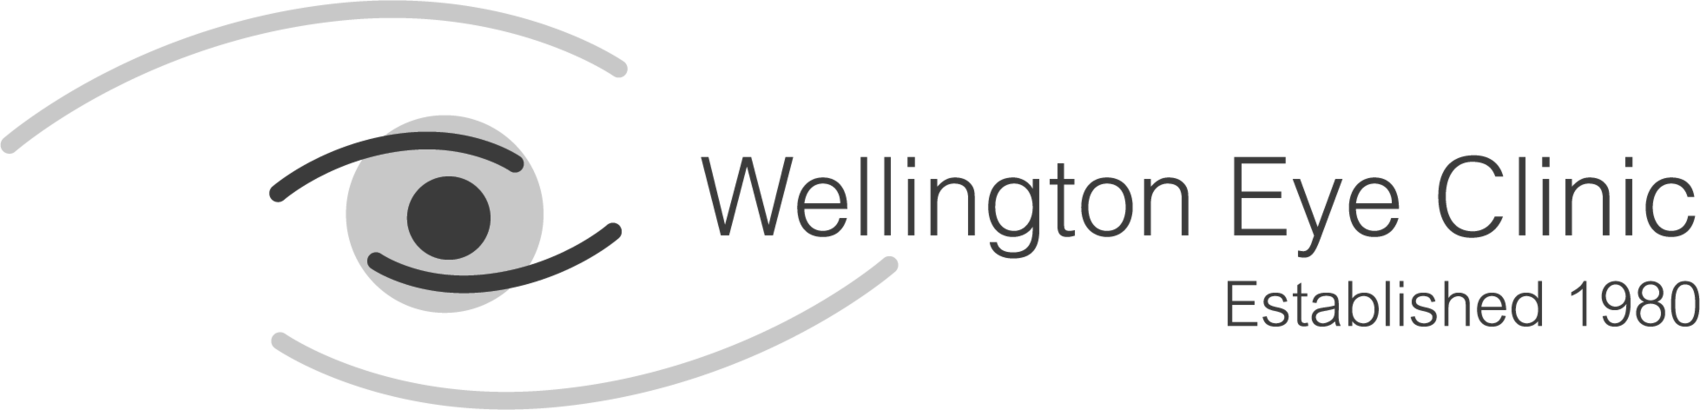 Wellington Eye Clinic Logo